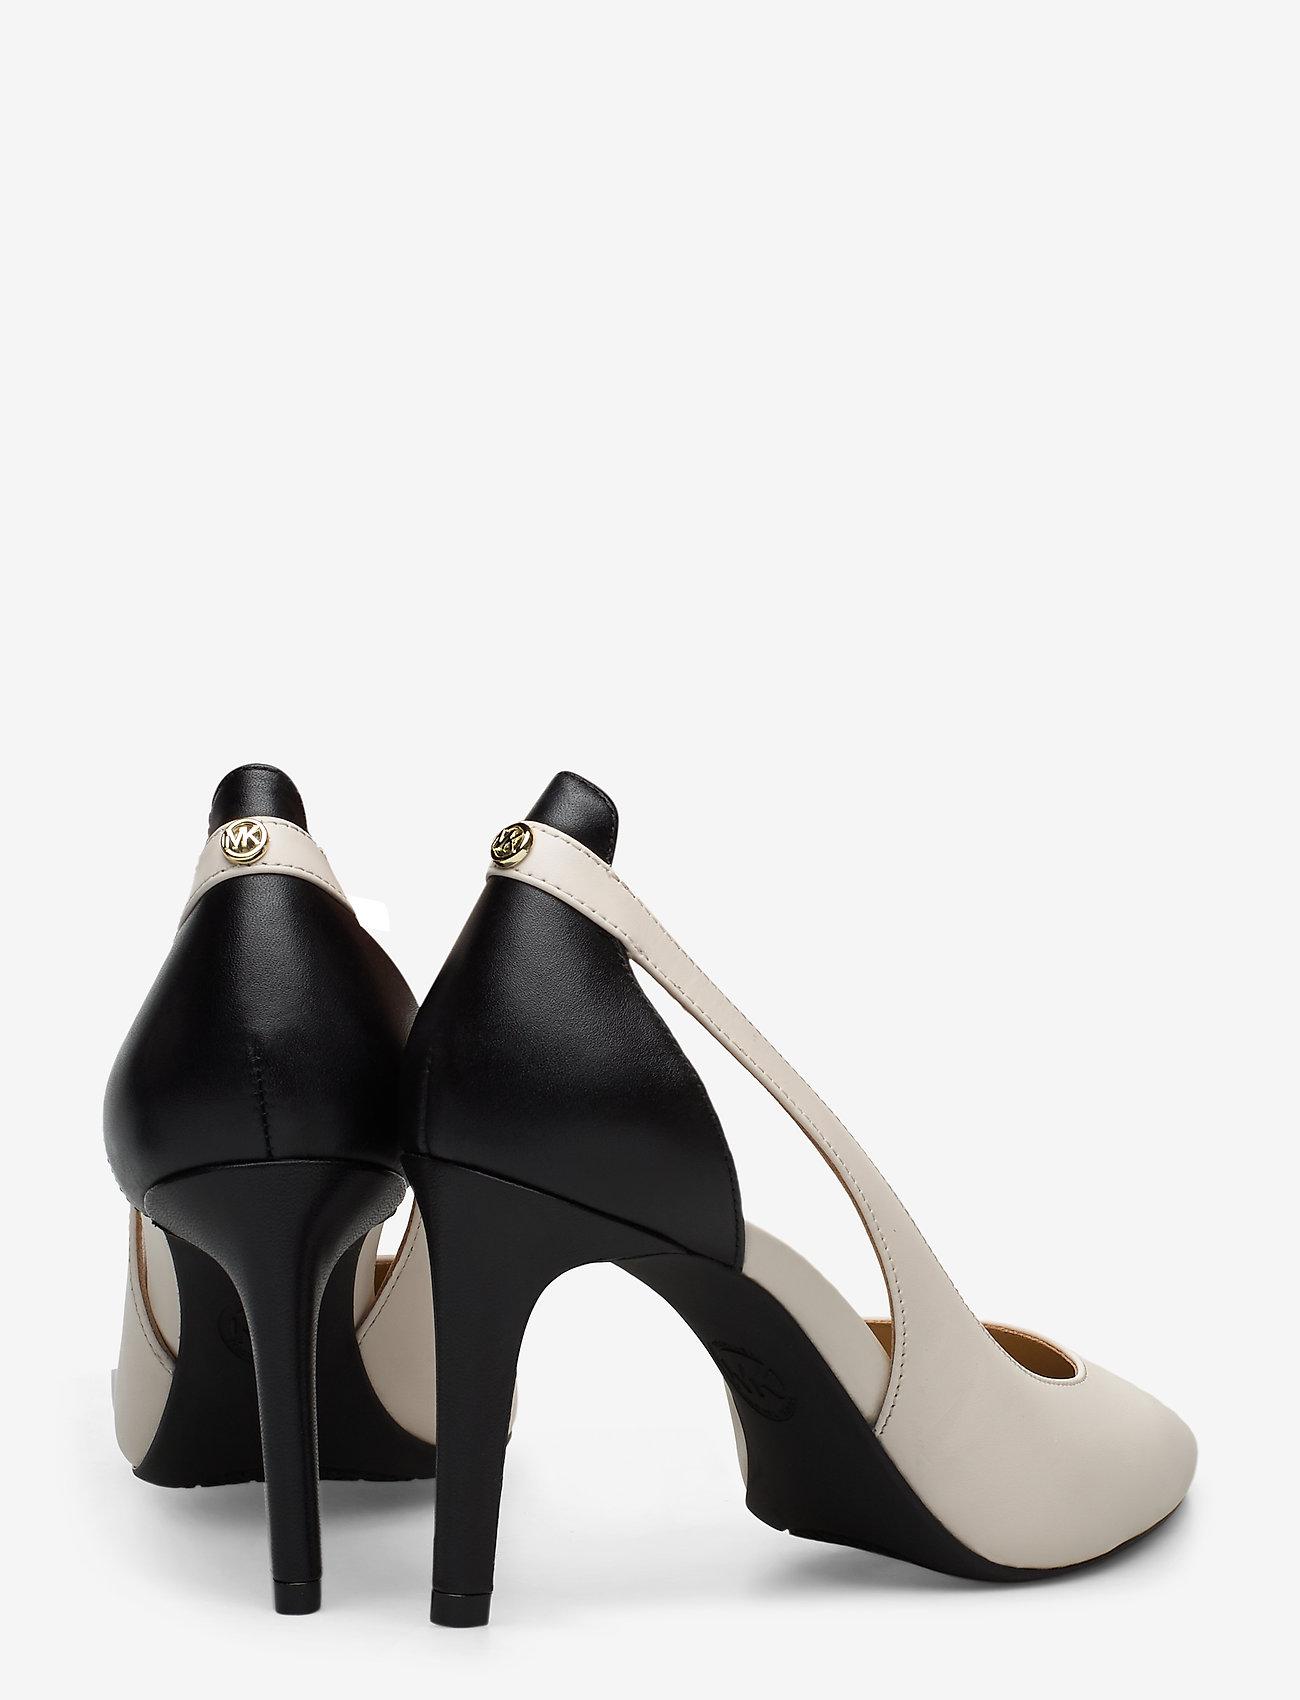 Cersei Flex Mid (Lt Cream) (130 €) - Michael Kors Shoes KPUgV